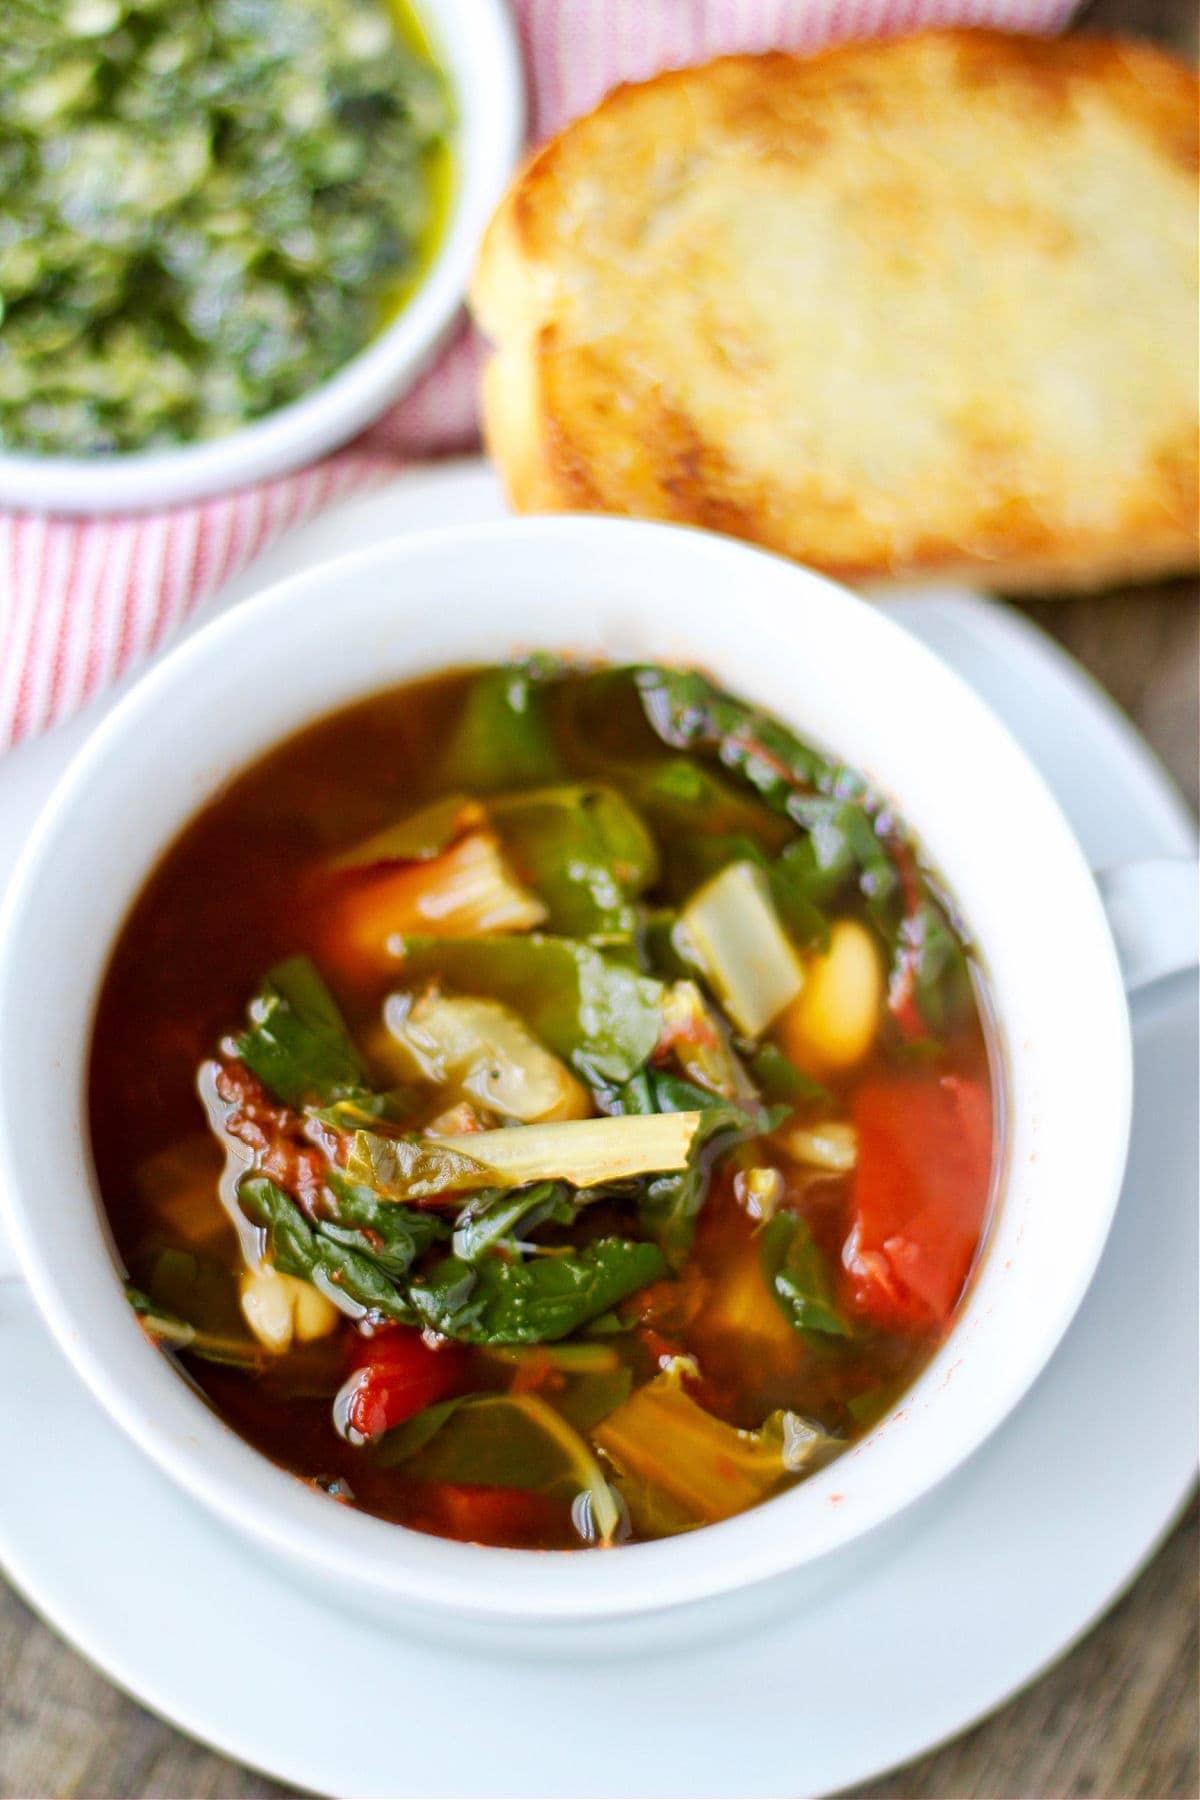 Pesto soup with bread.